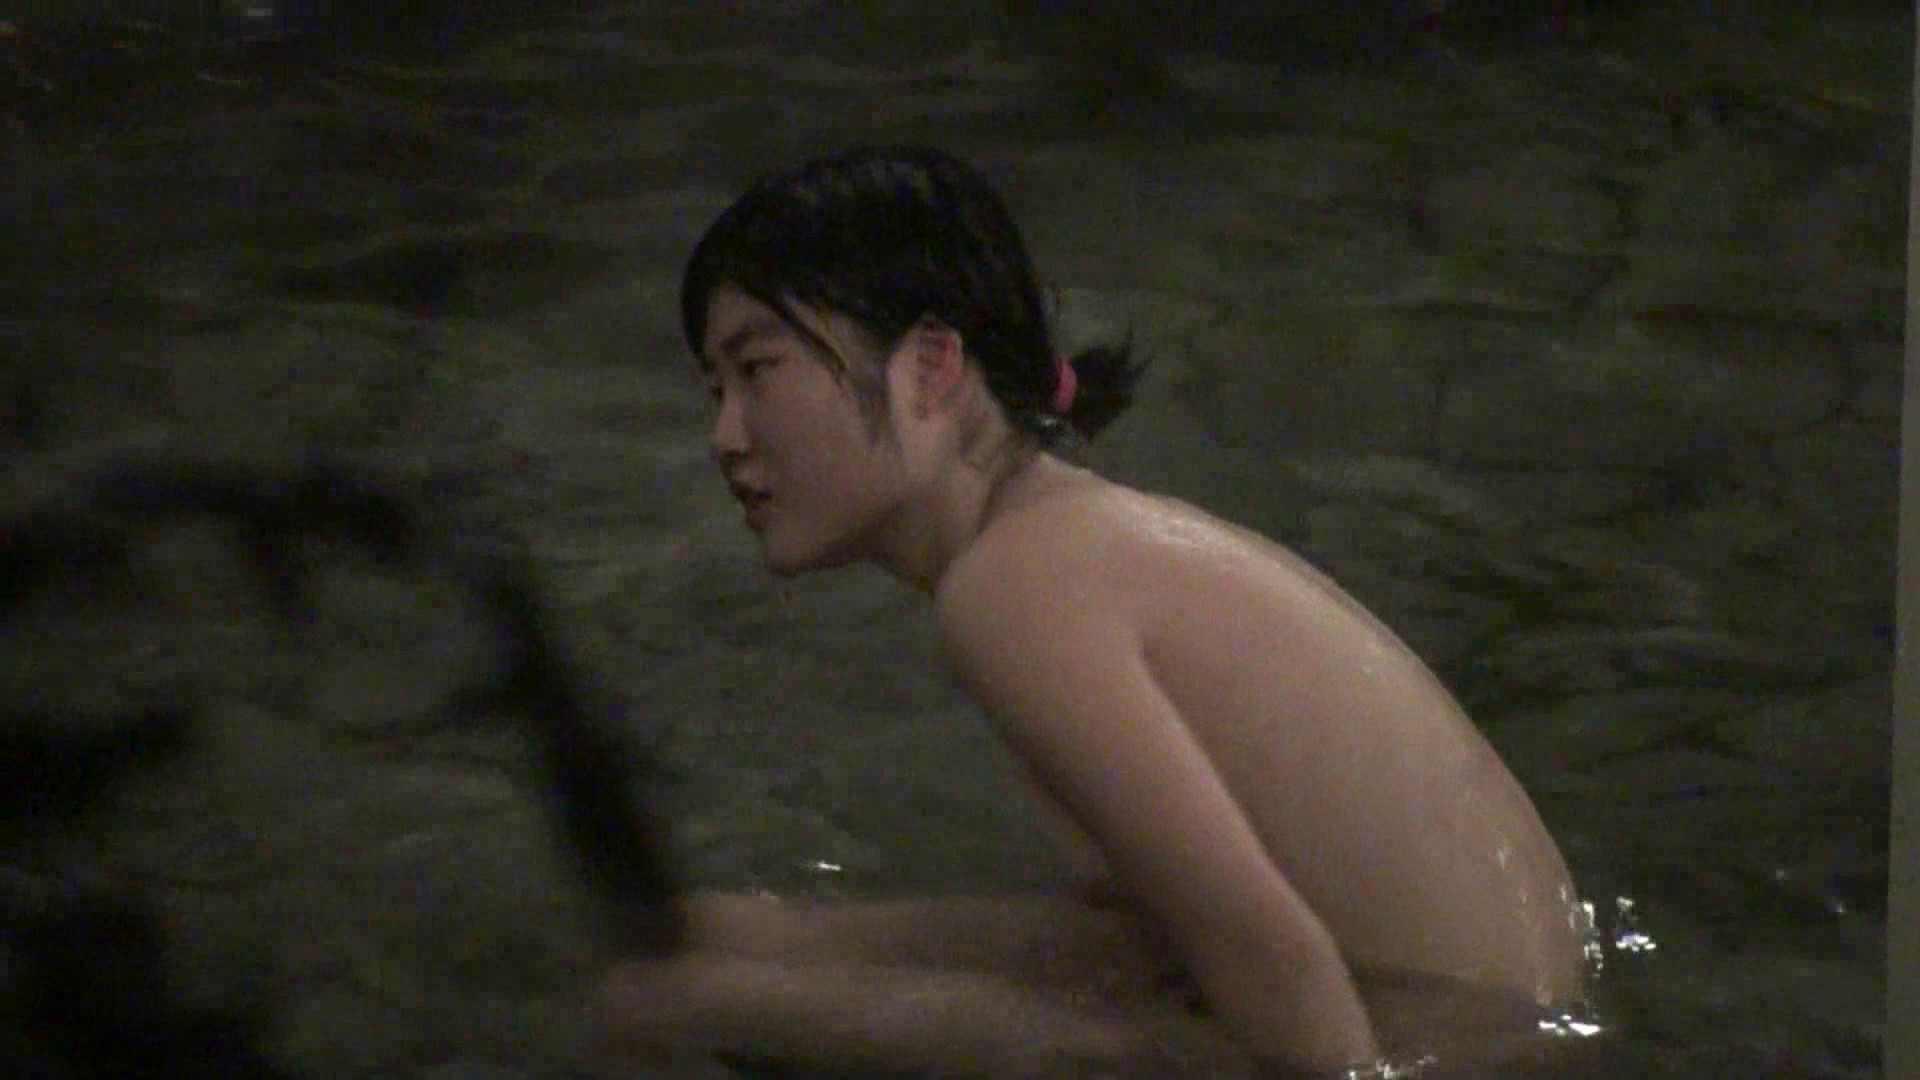 Aquaな露天風呂Vol.343 0  83連発 6